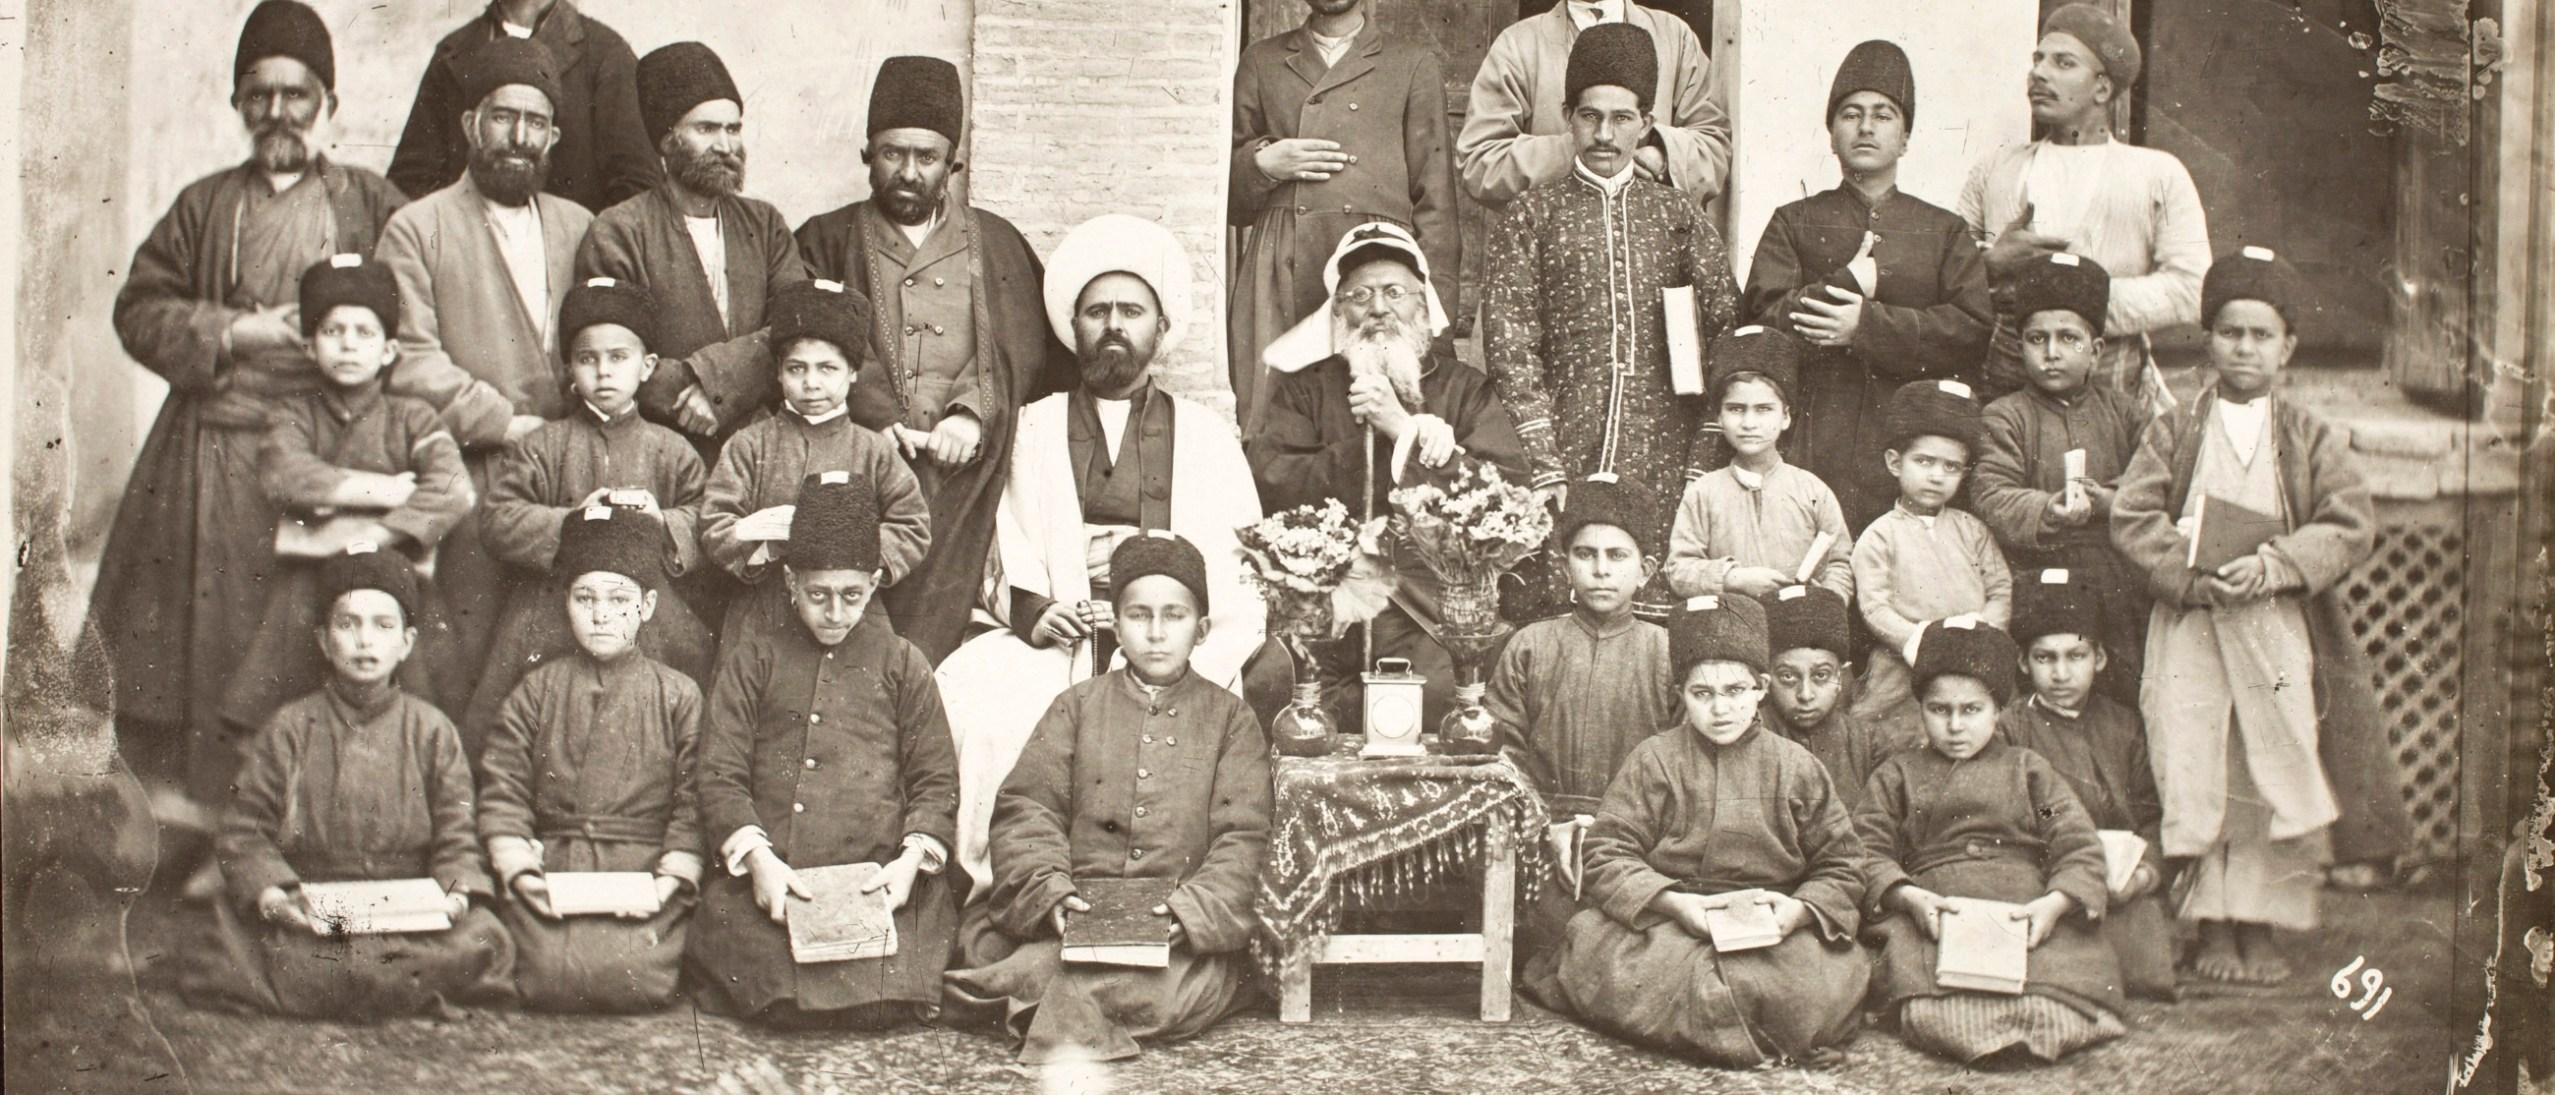 Photo, Persian School Sevruguin, Antoin, 1870s-1928, b&w ; 21.8 cm. x 16.6 cm. FSA_A.4_2.12.Up.60